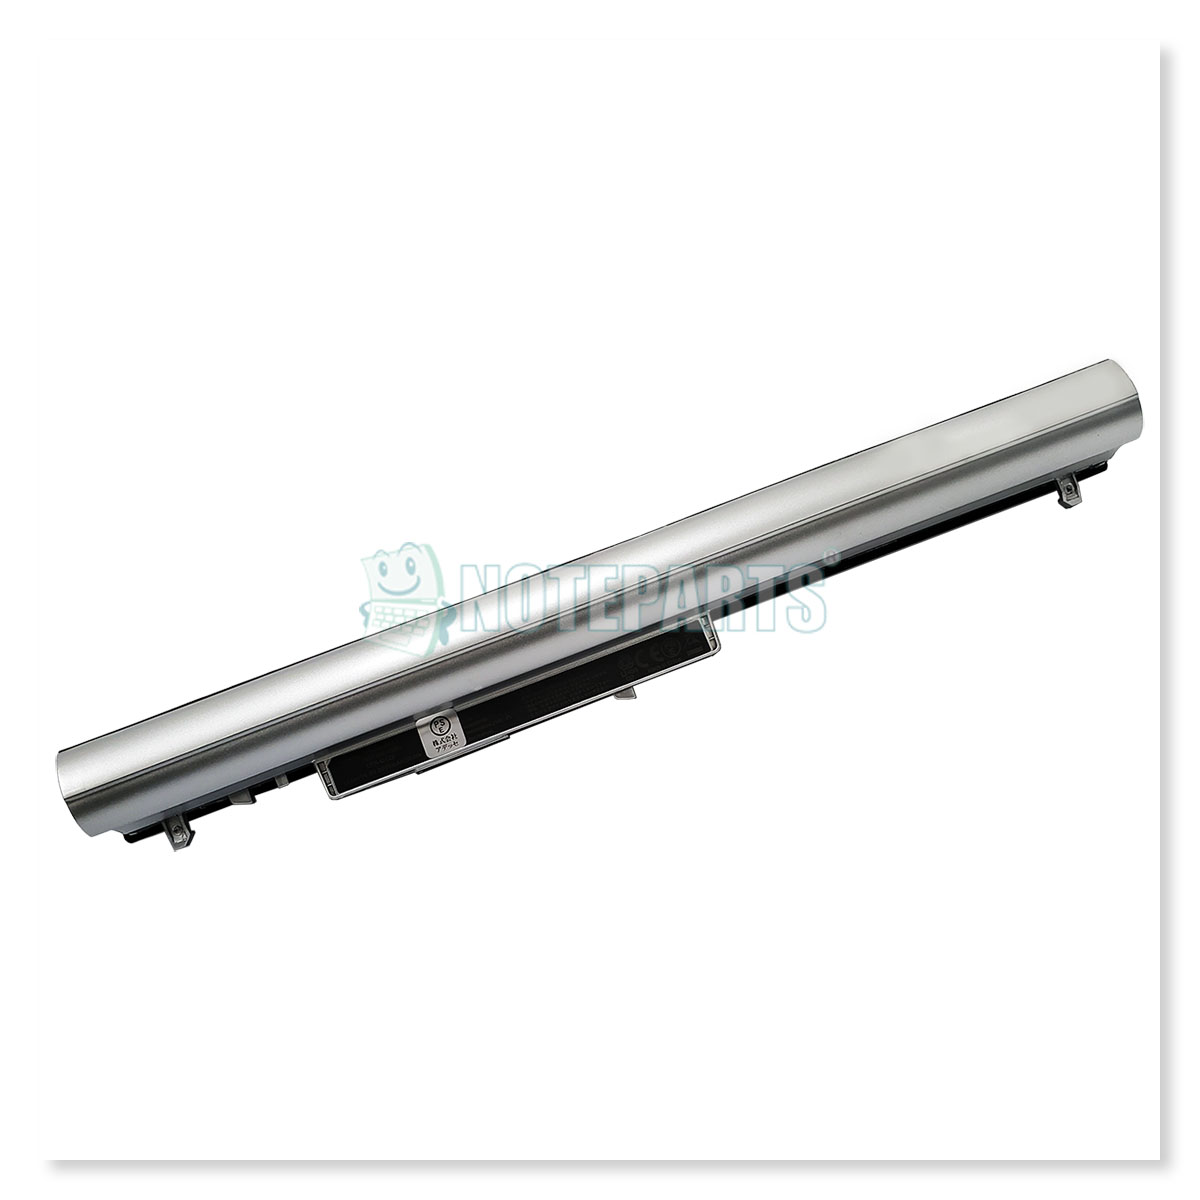 HP Pavilion 14-n000 14n-200 15-n000 15-n200  バッテリー LA04(シルバー)対応